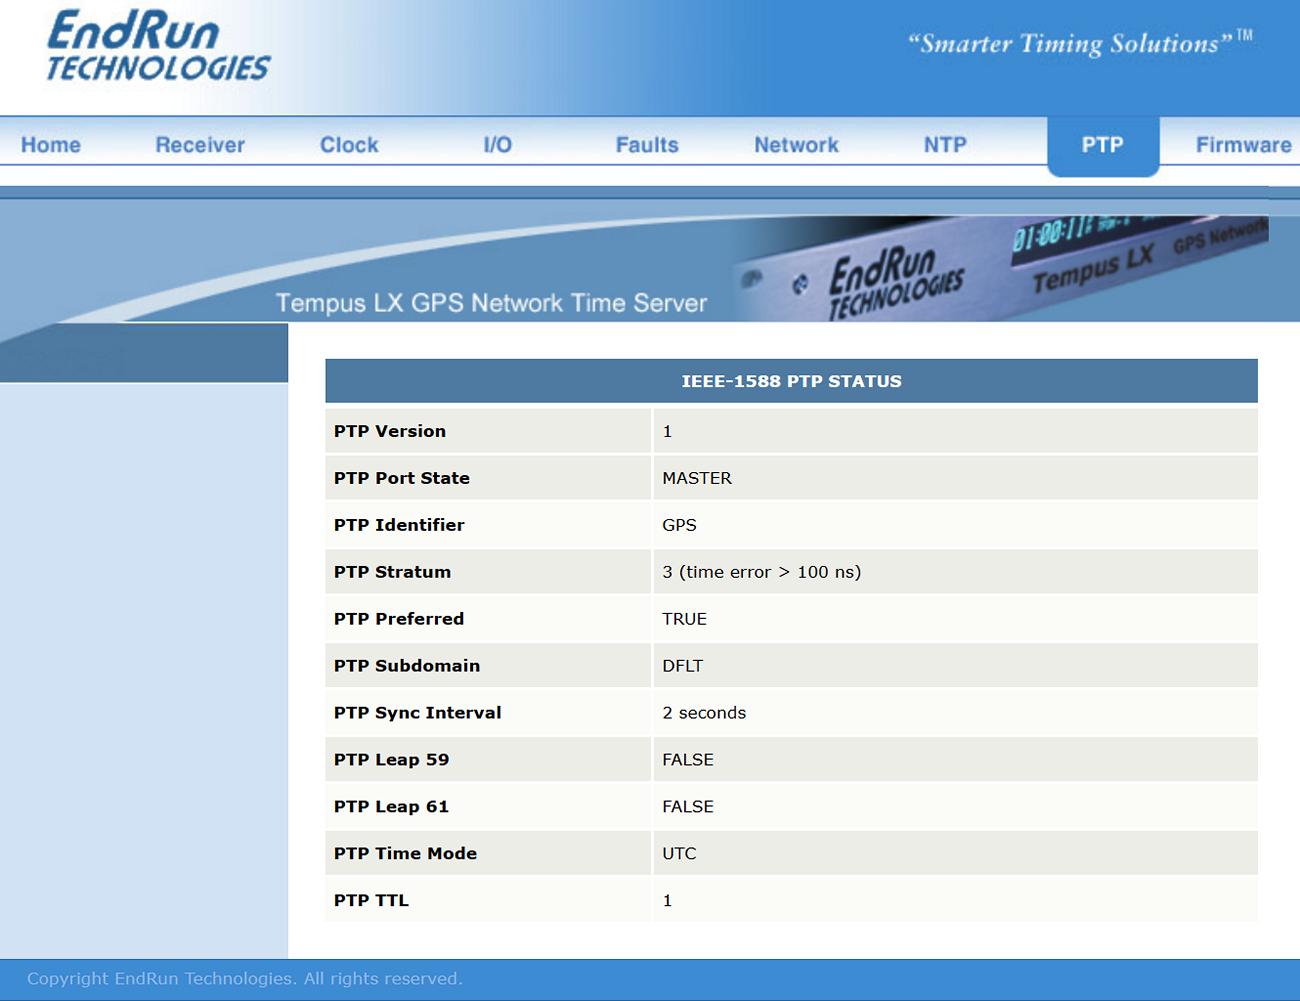 https://www.prostudioconnection.net/2012/12-27-2020%2012-14-24%20PM.PNG